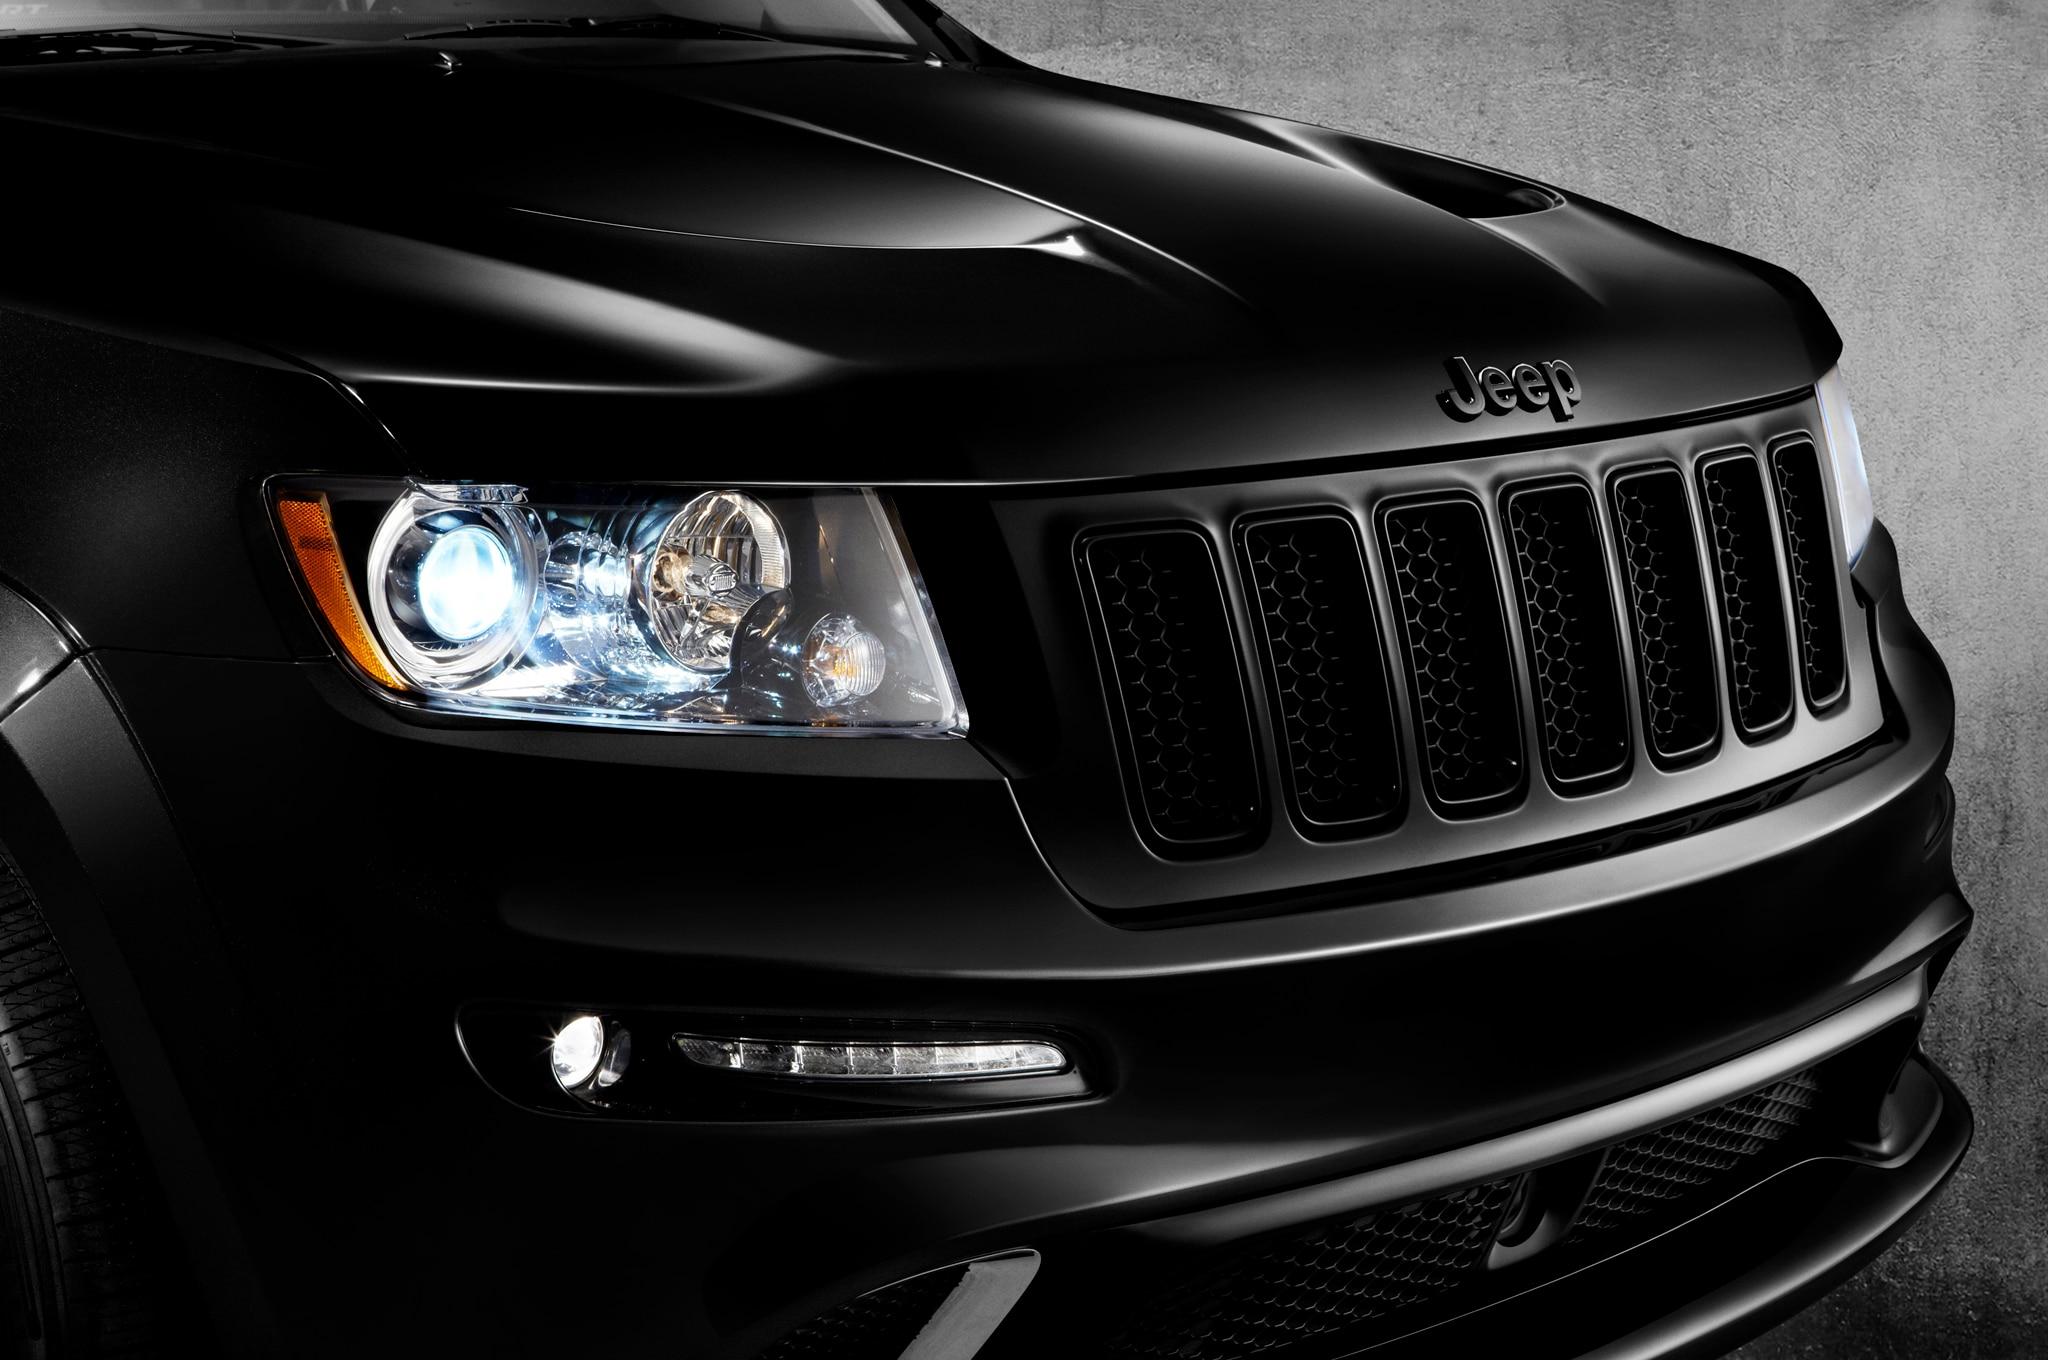 2013 jeep grand cherokee srt8 gains new vapor alpine. Black Bedroom Furniture Sets. Home Design Ideas